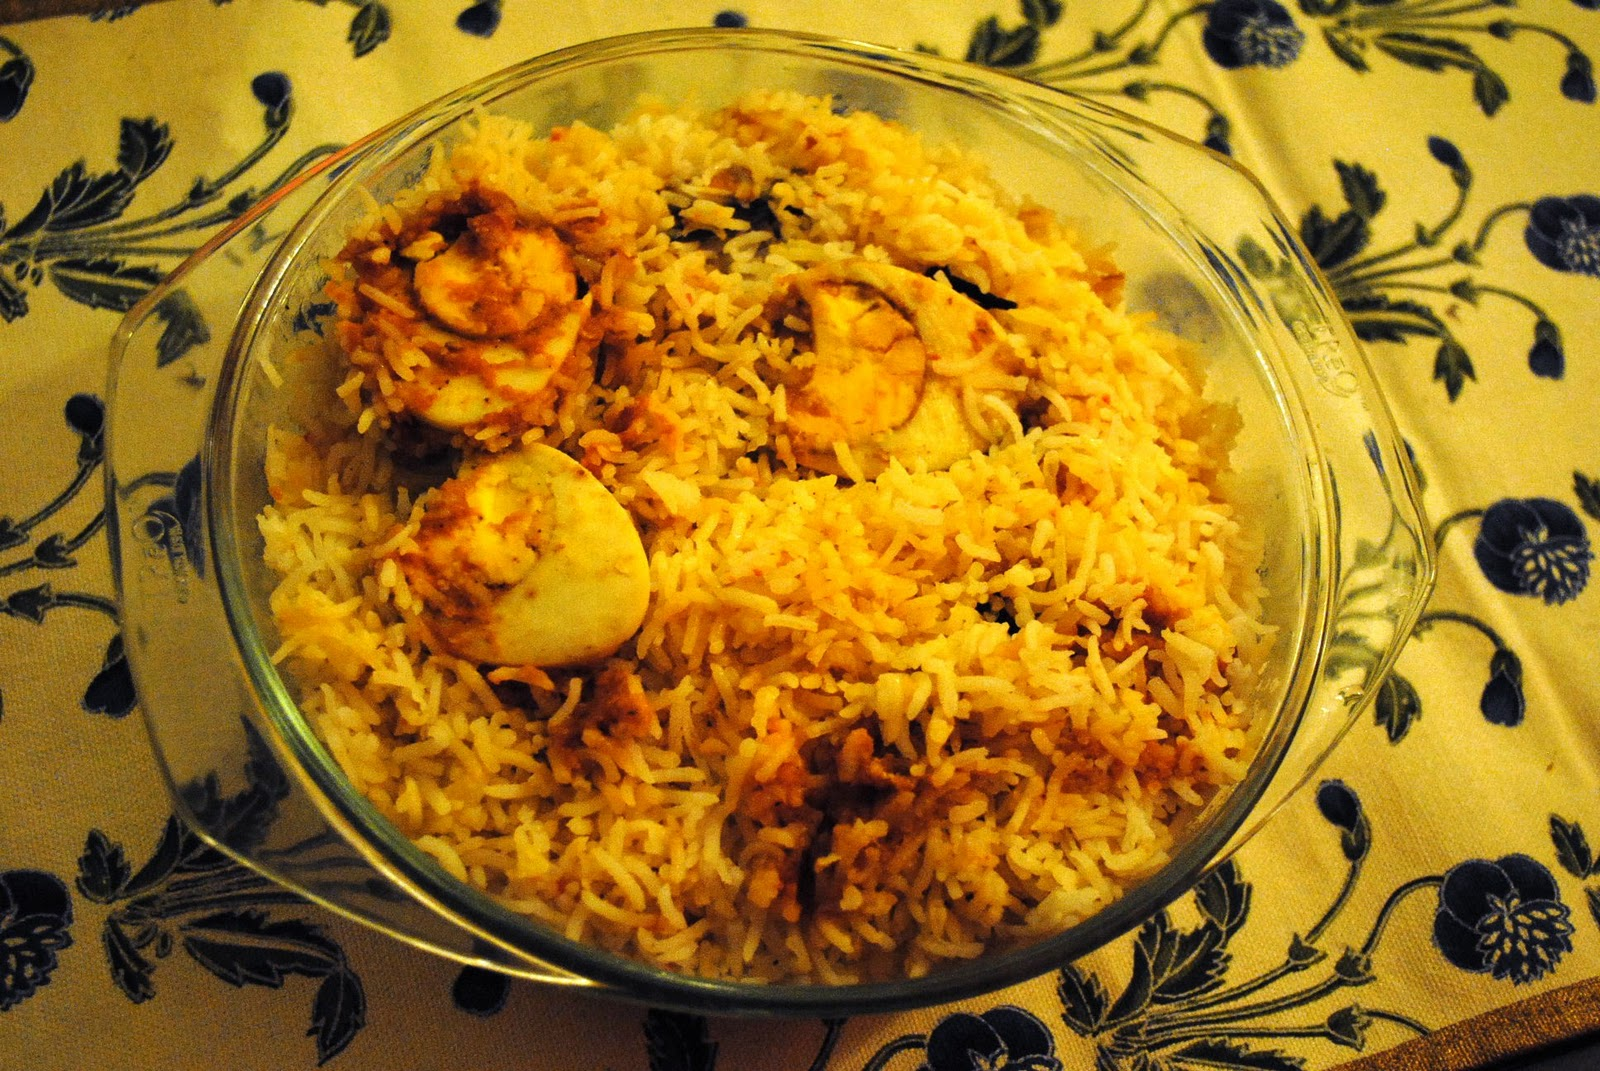 Peppermill: Tamil Egg Biryani - Pratibha Karan